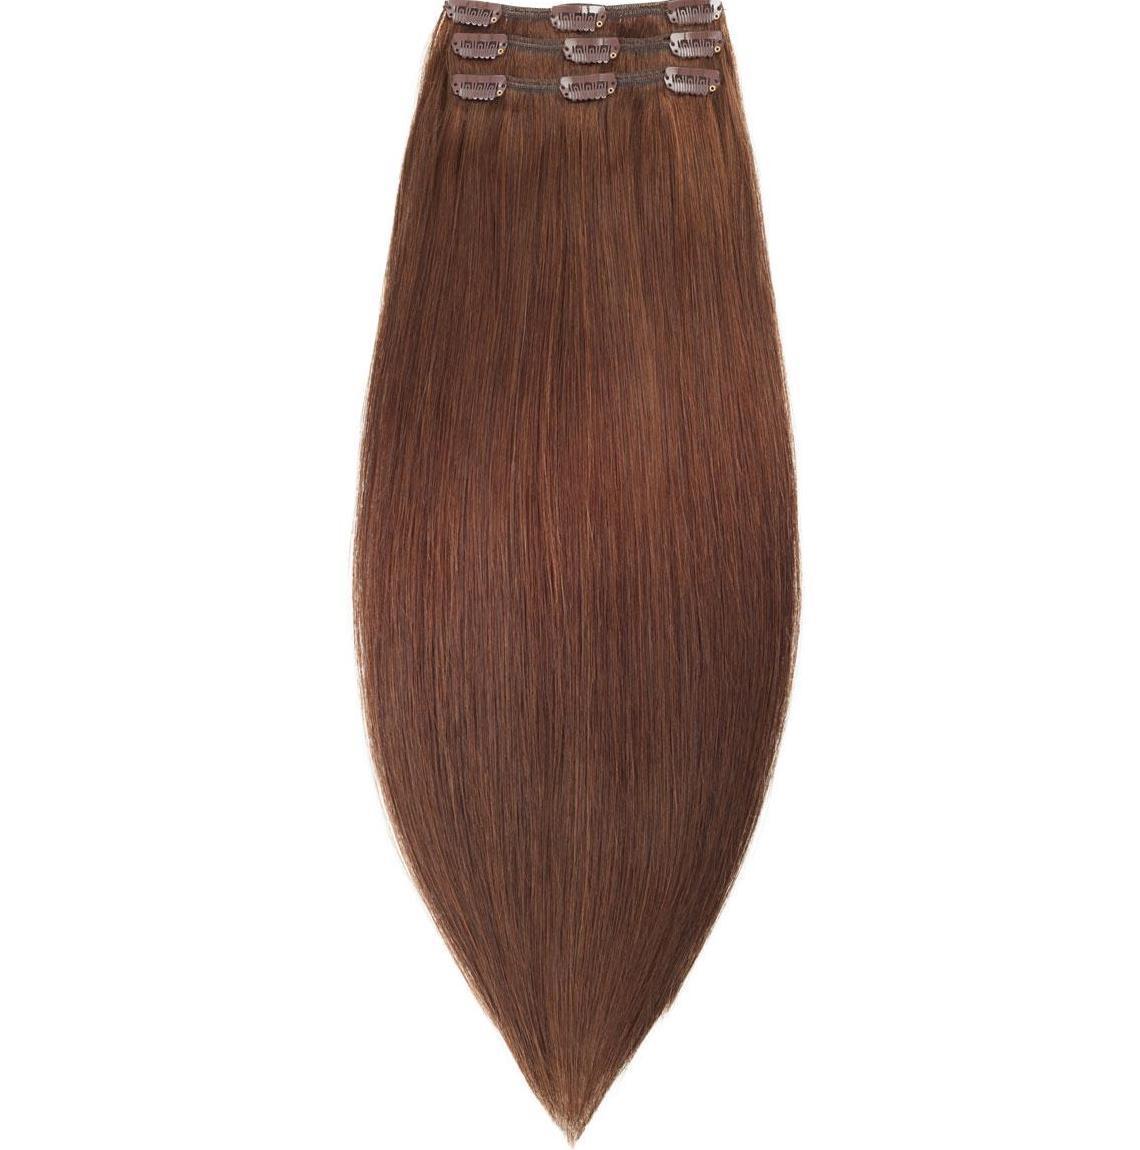 Волосы на заколках 50 см. Цвет #04 Шоколад